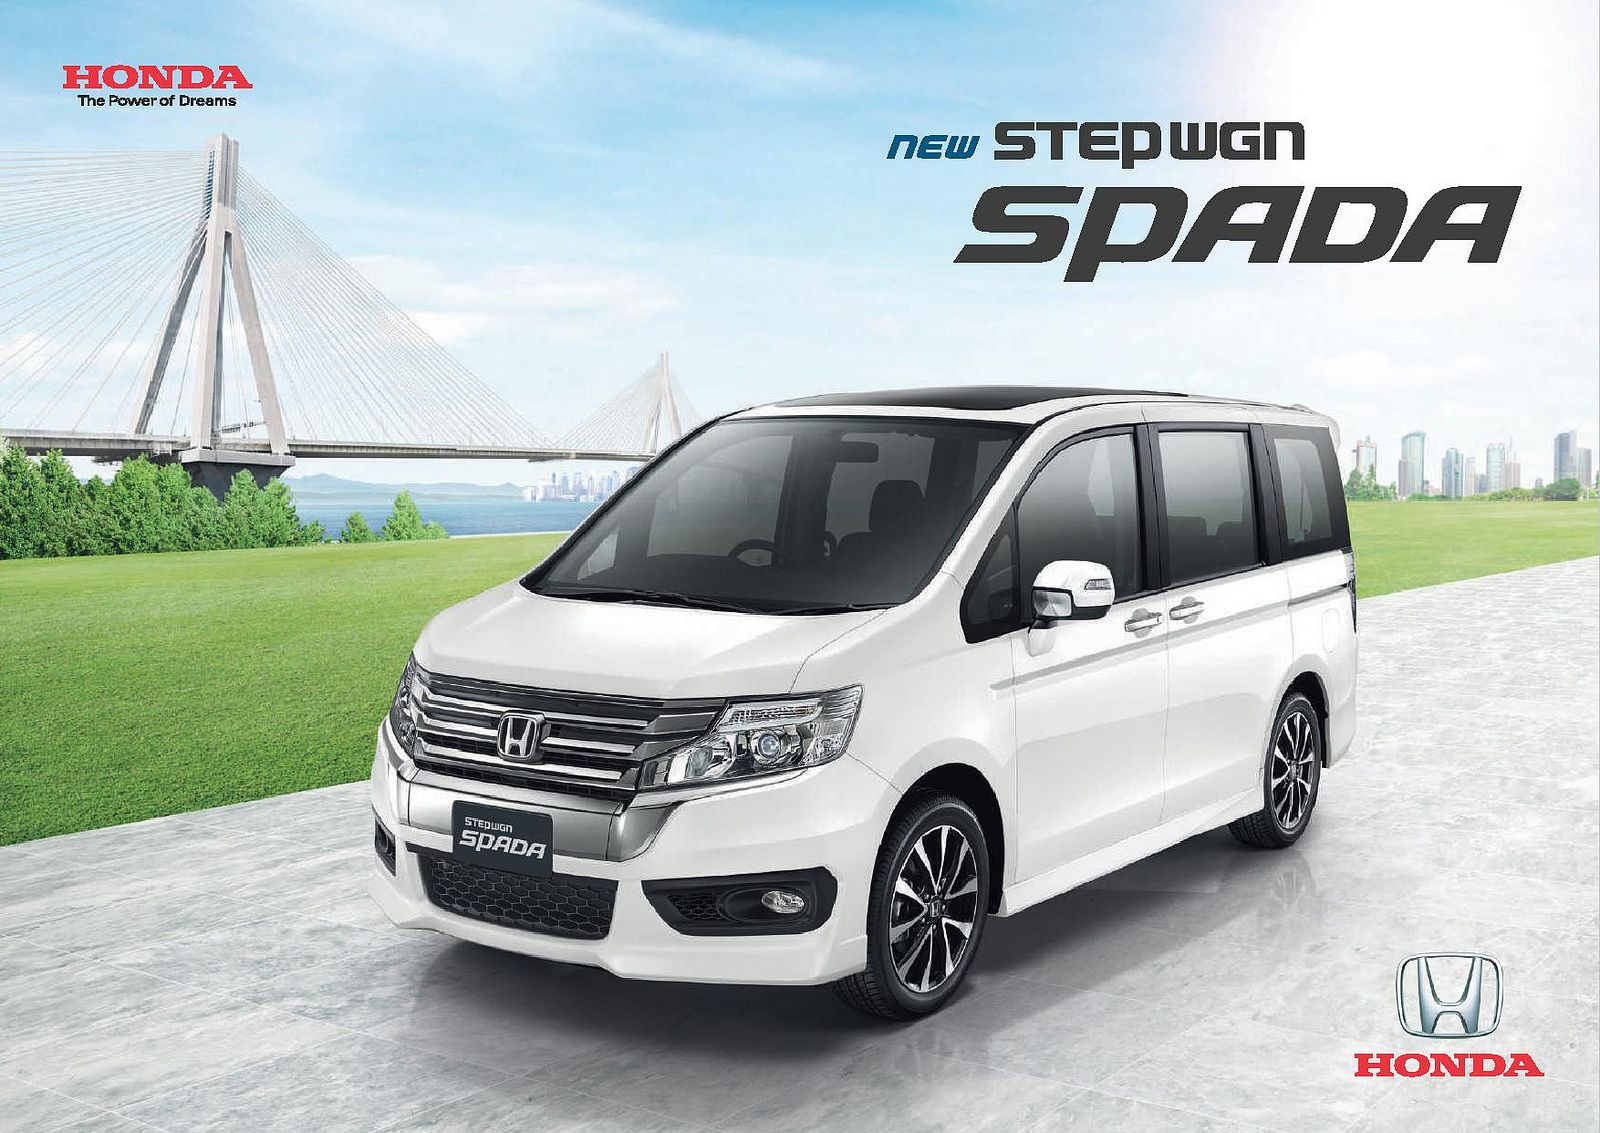 Honda Stepwgn Spada Thailand Brochure 2013 Honda, Thailand, Brochures